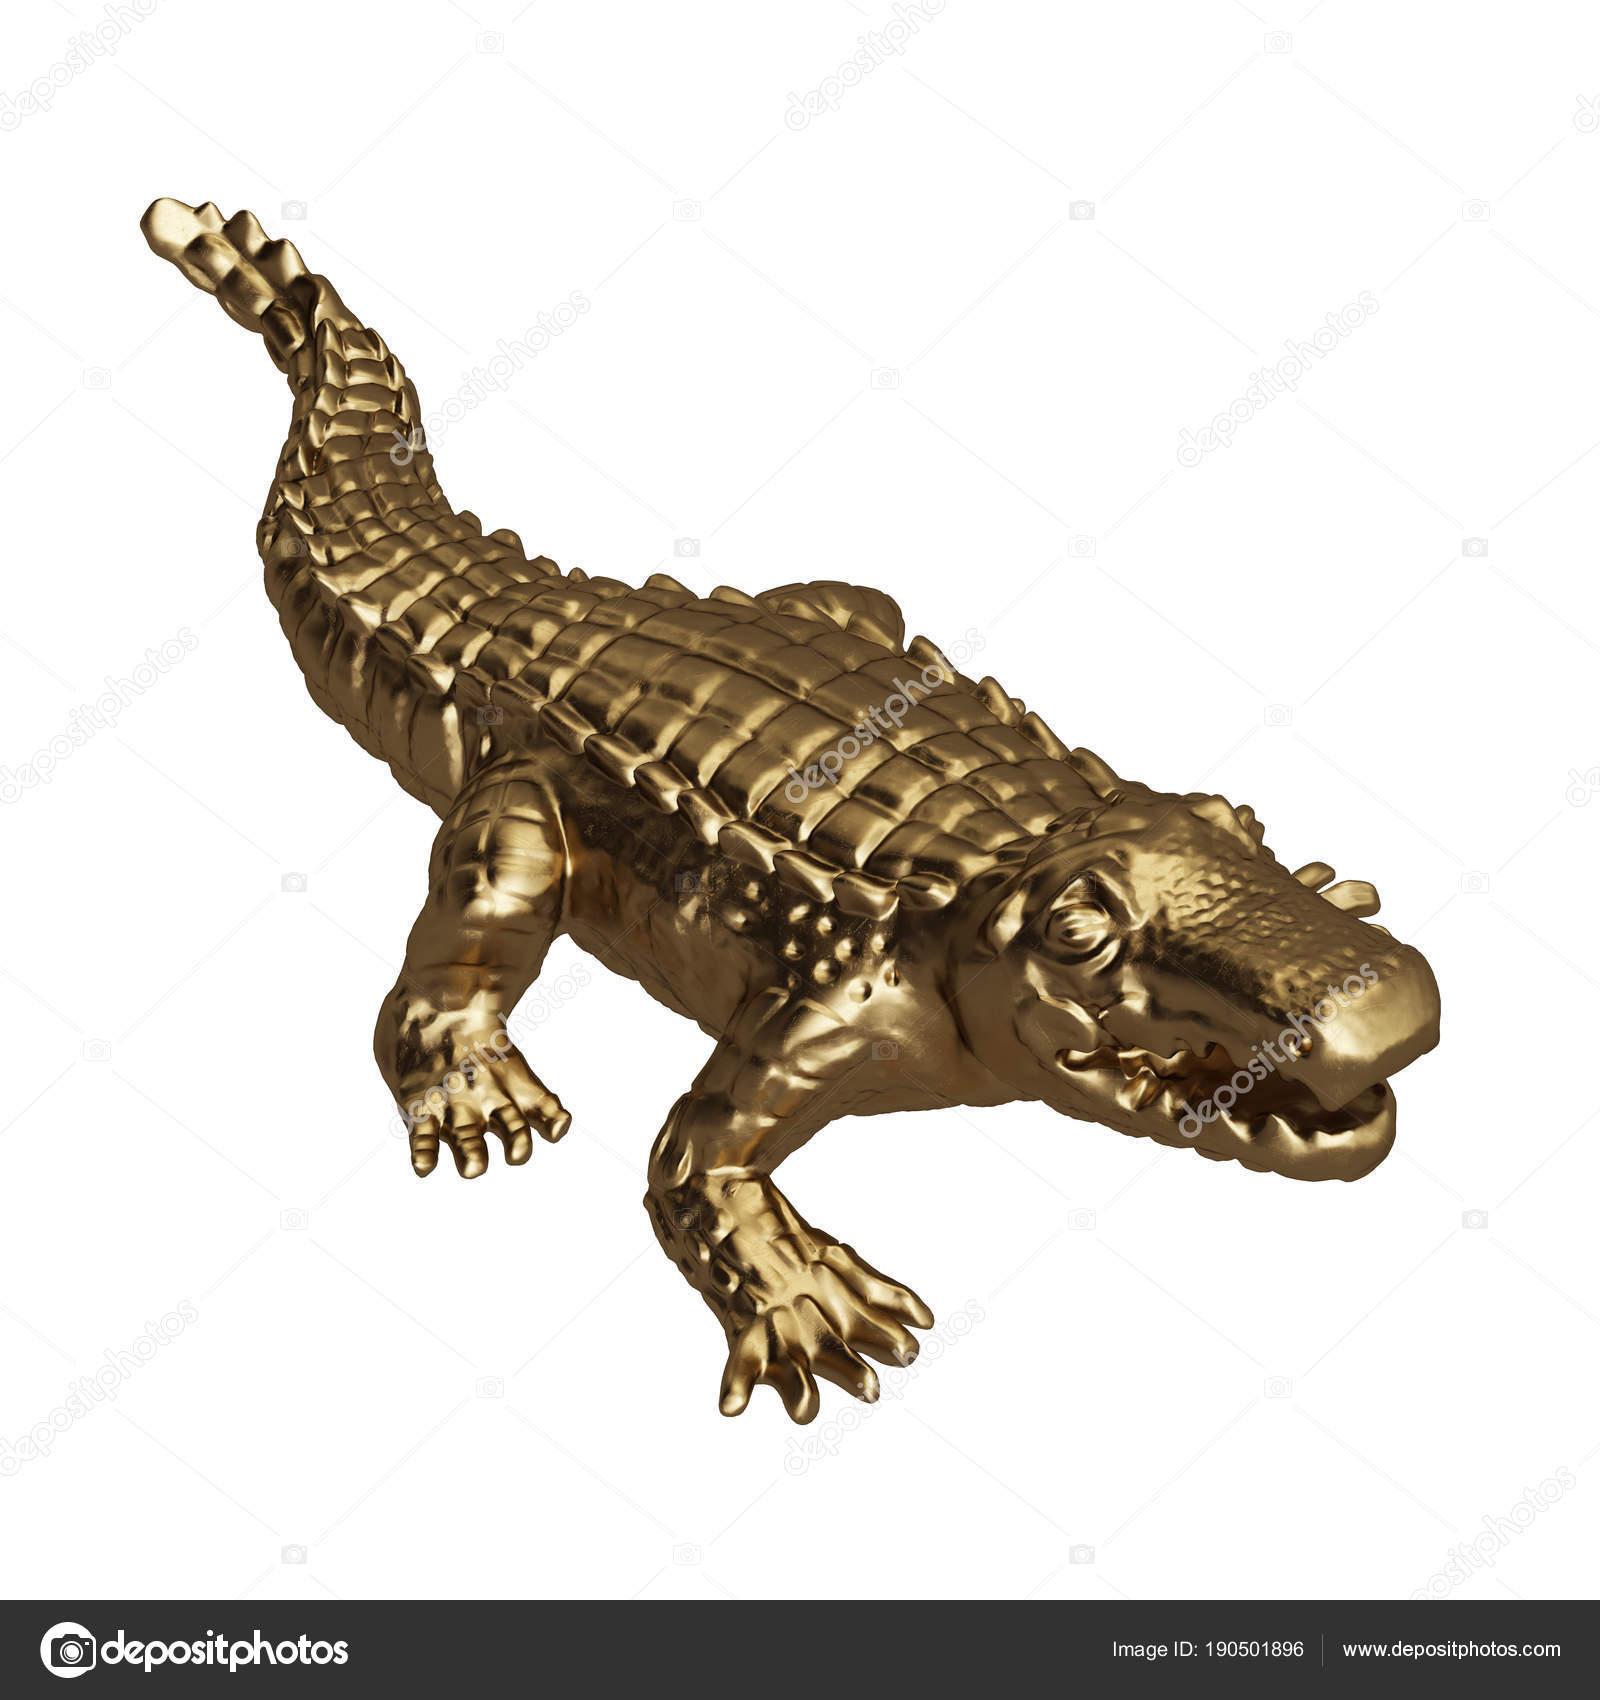 60b2514e3 Crocodilo Dourado Escultura Isolado Fundo Branco Processamento Digital  Illustration — Fotografia de Stock